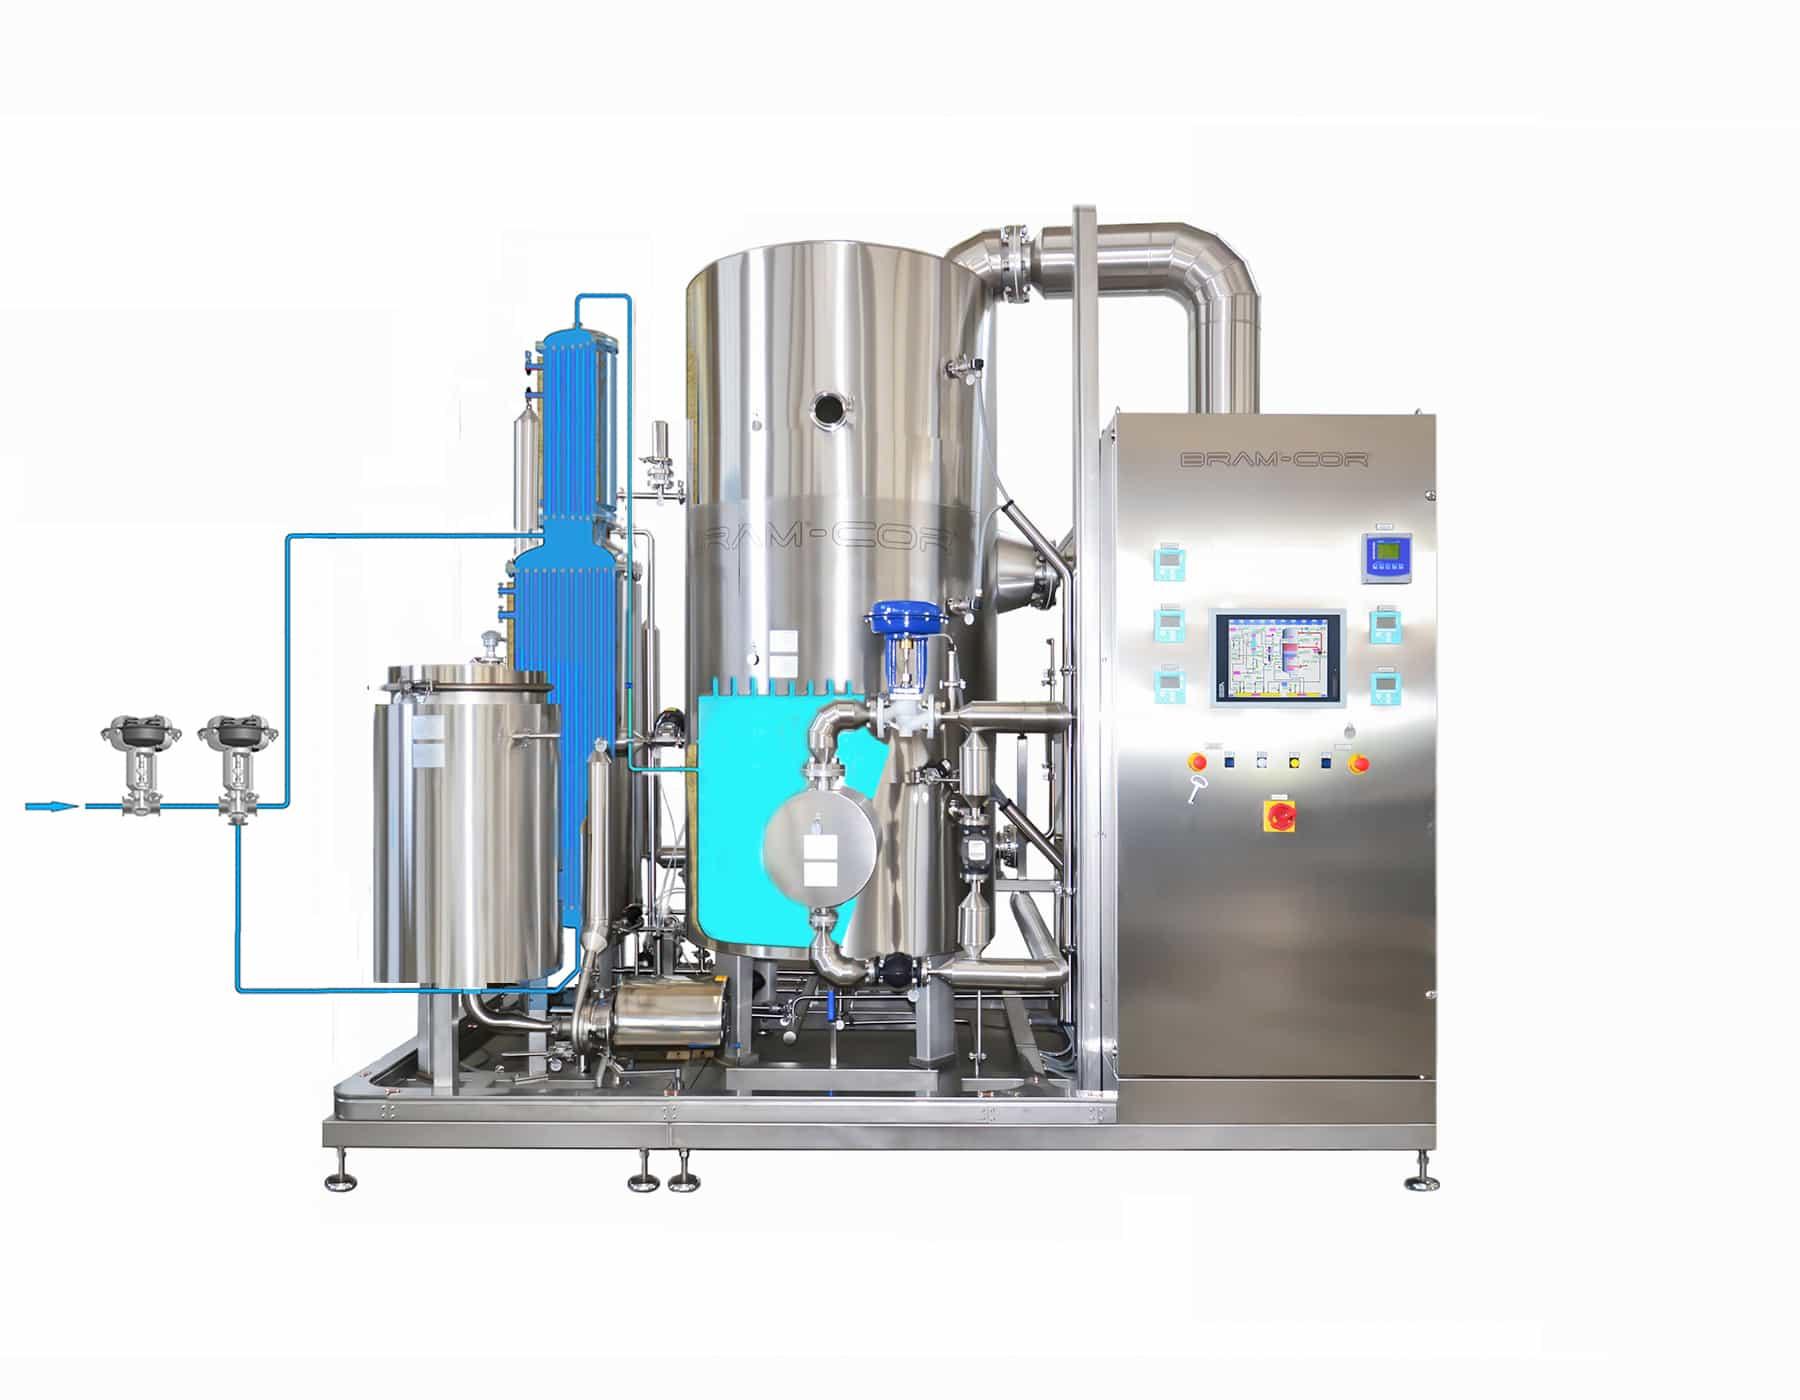 Vapor Compression Distillation process - Step 3